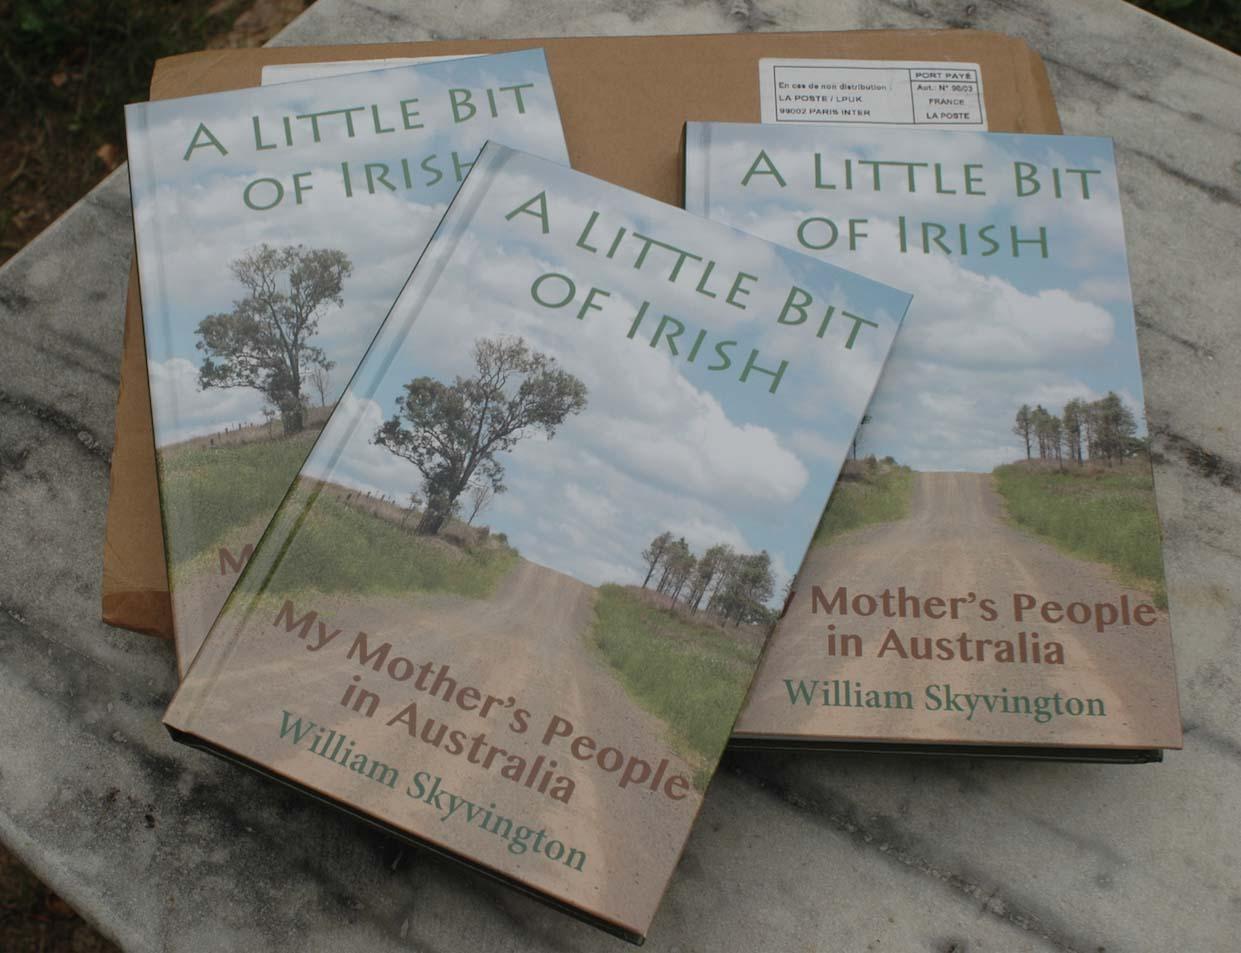 Gamone Press books delivered to my doorstep & Antipodes: Gamone Press books delivered to my doorstep